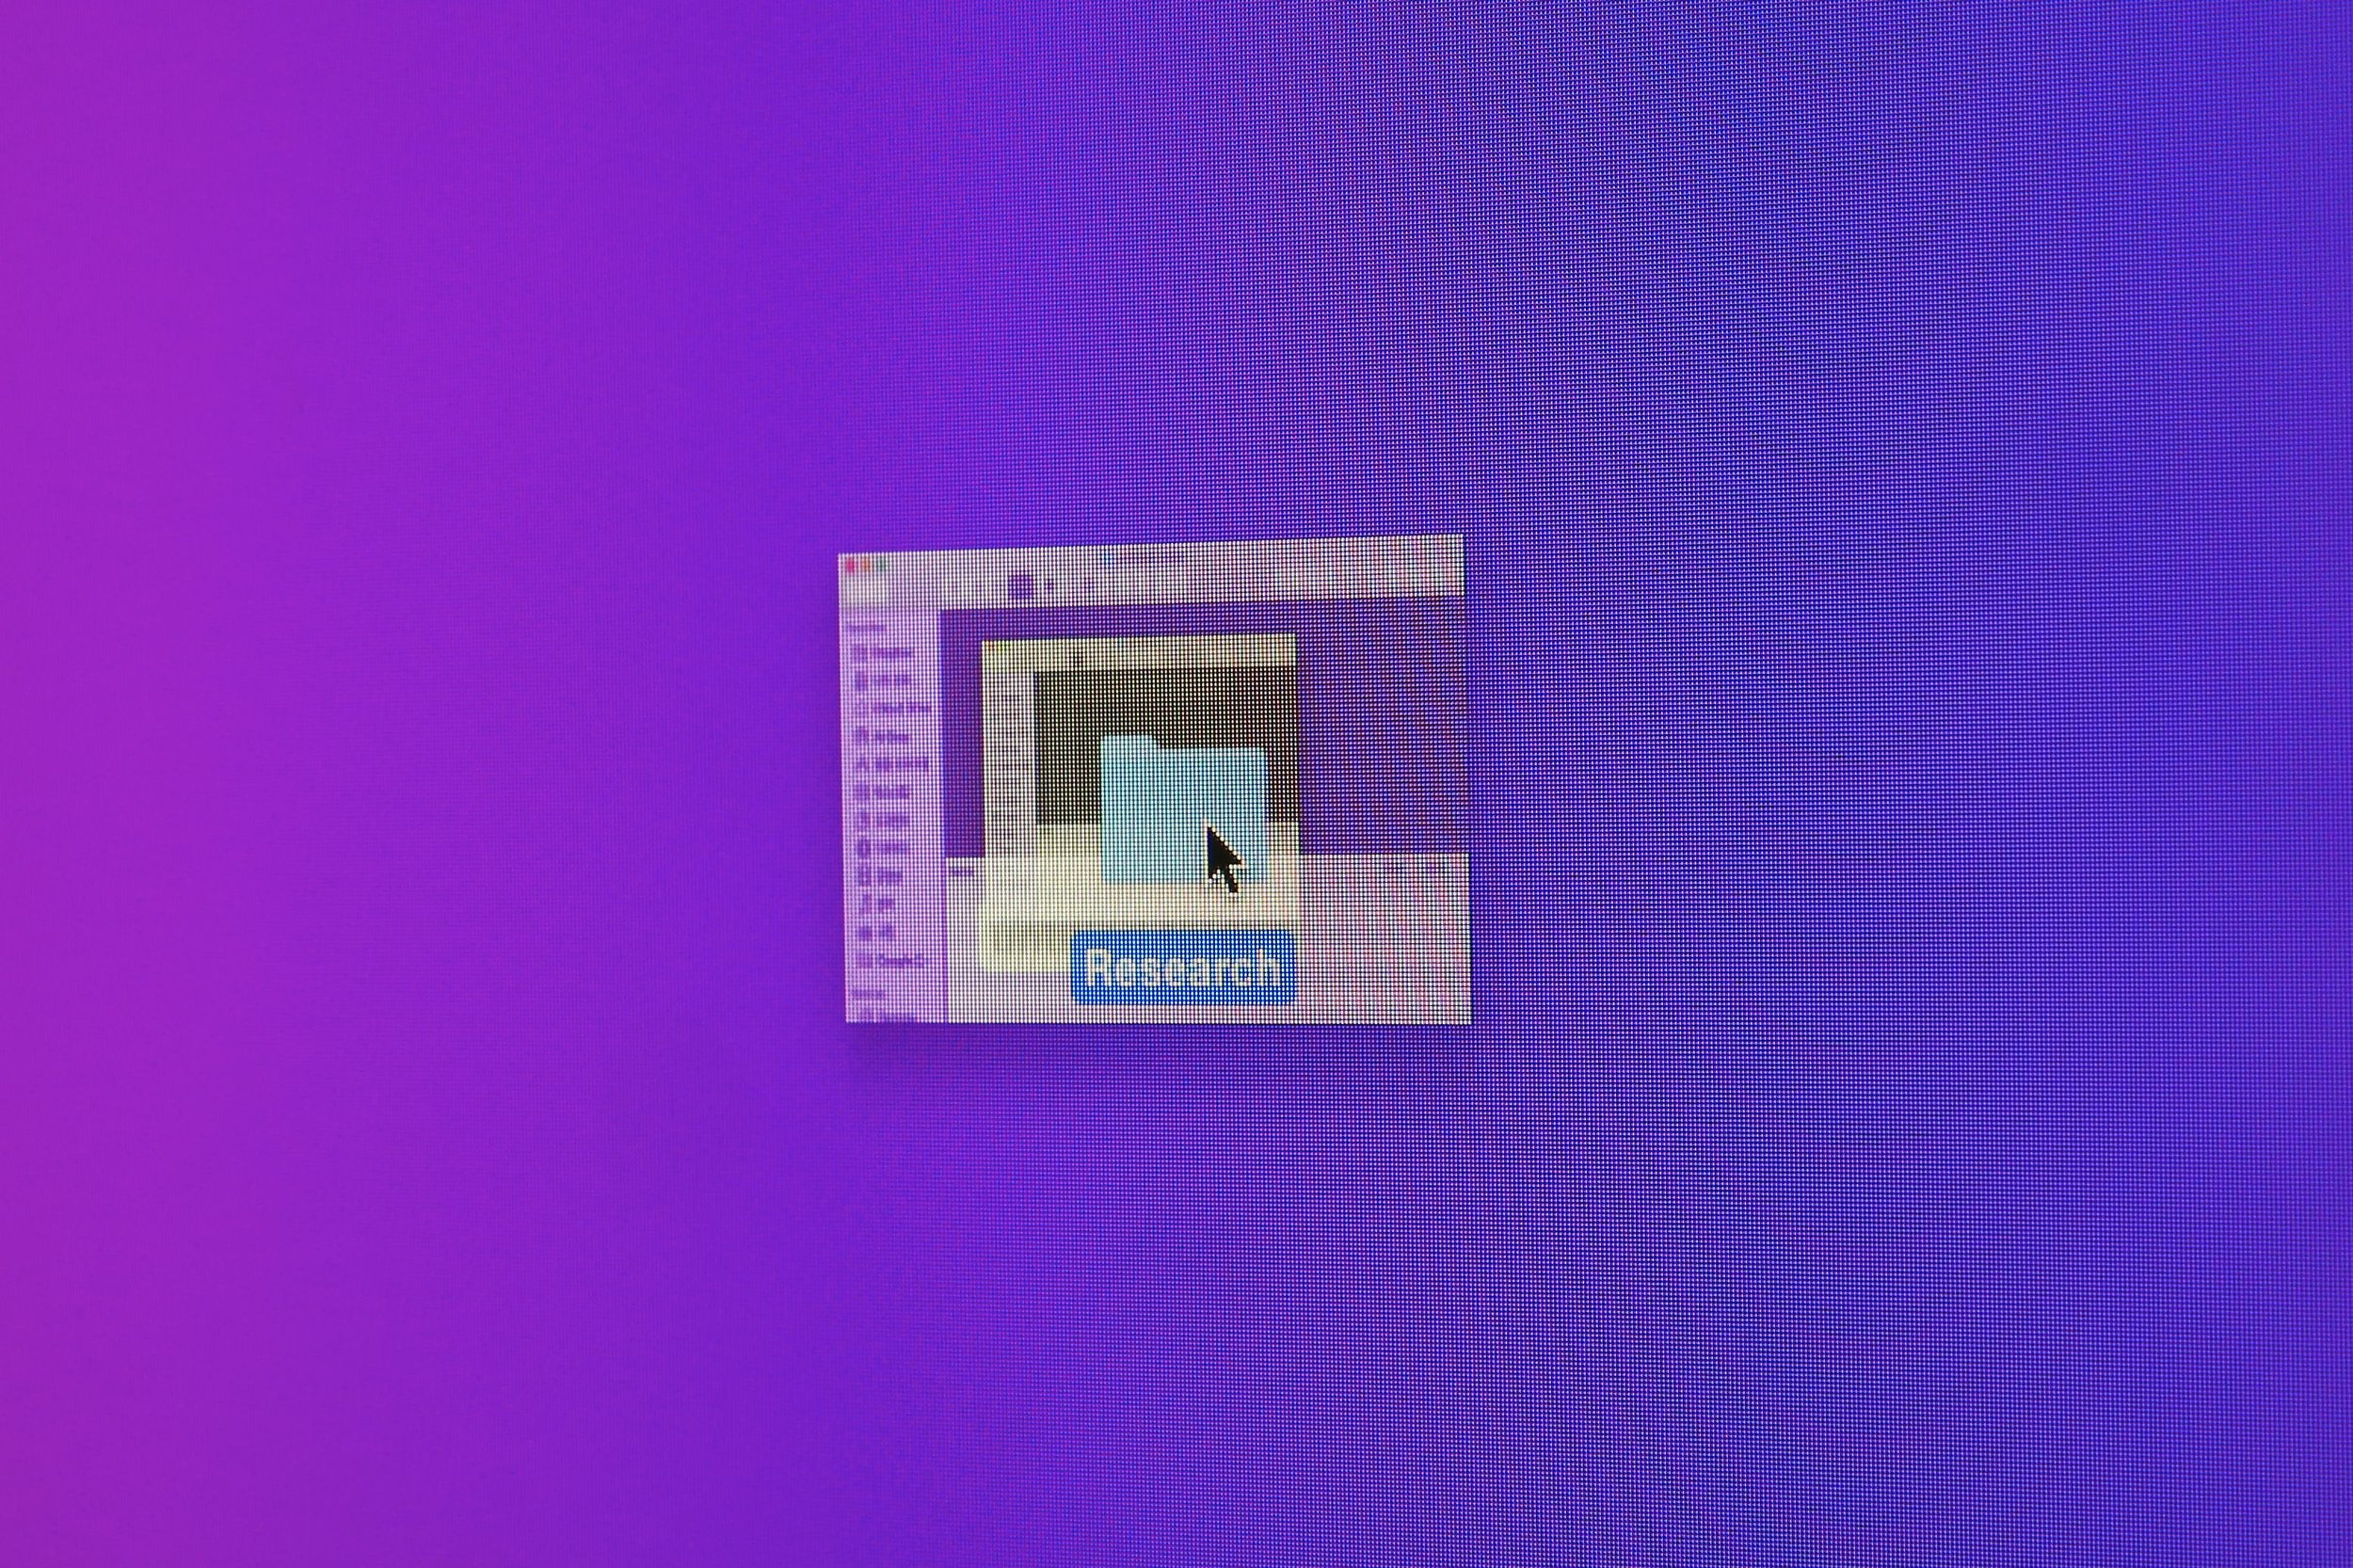 IT8A1768_edit.jpg